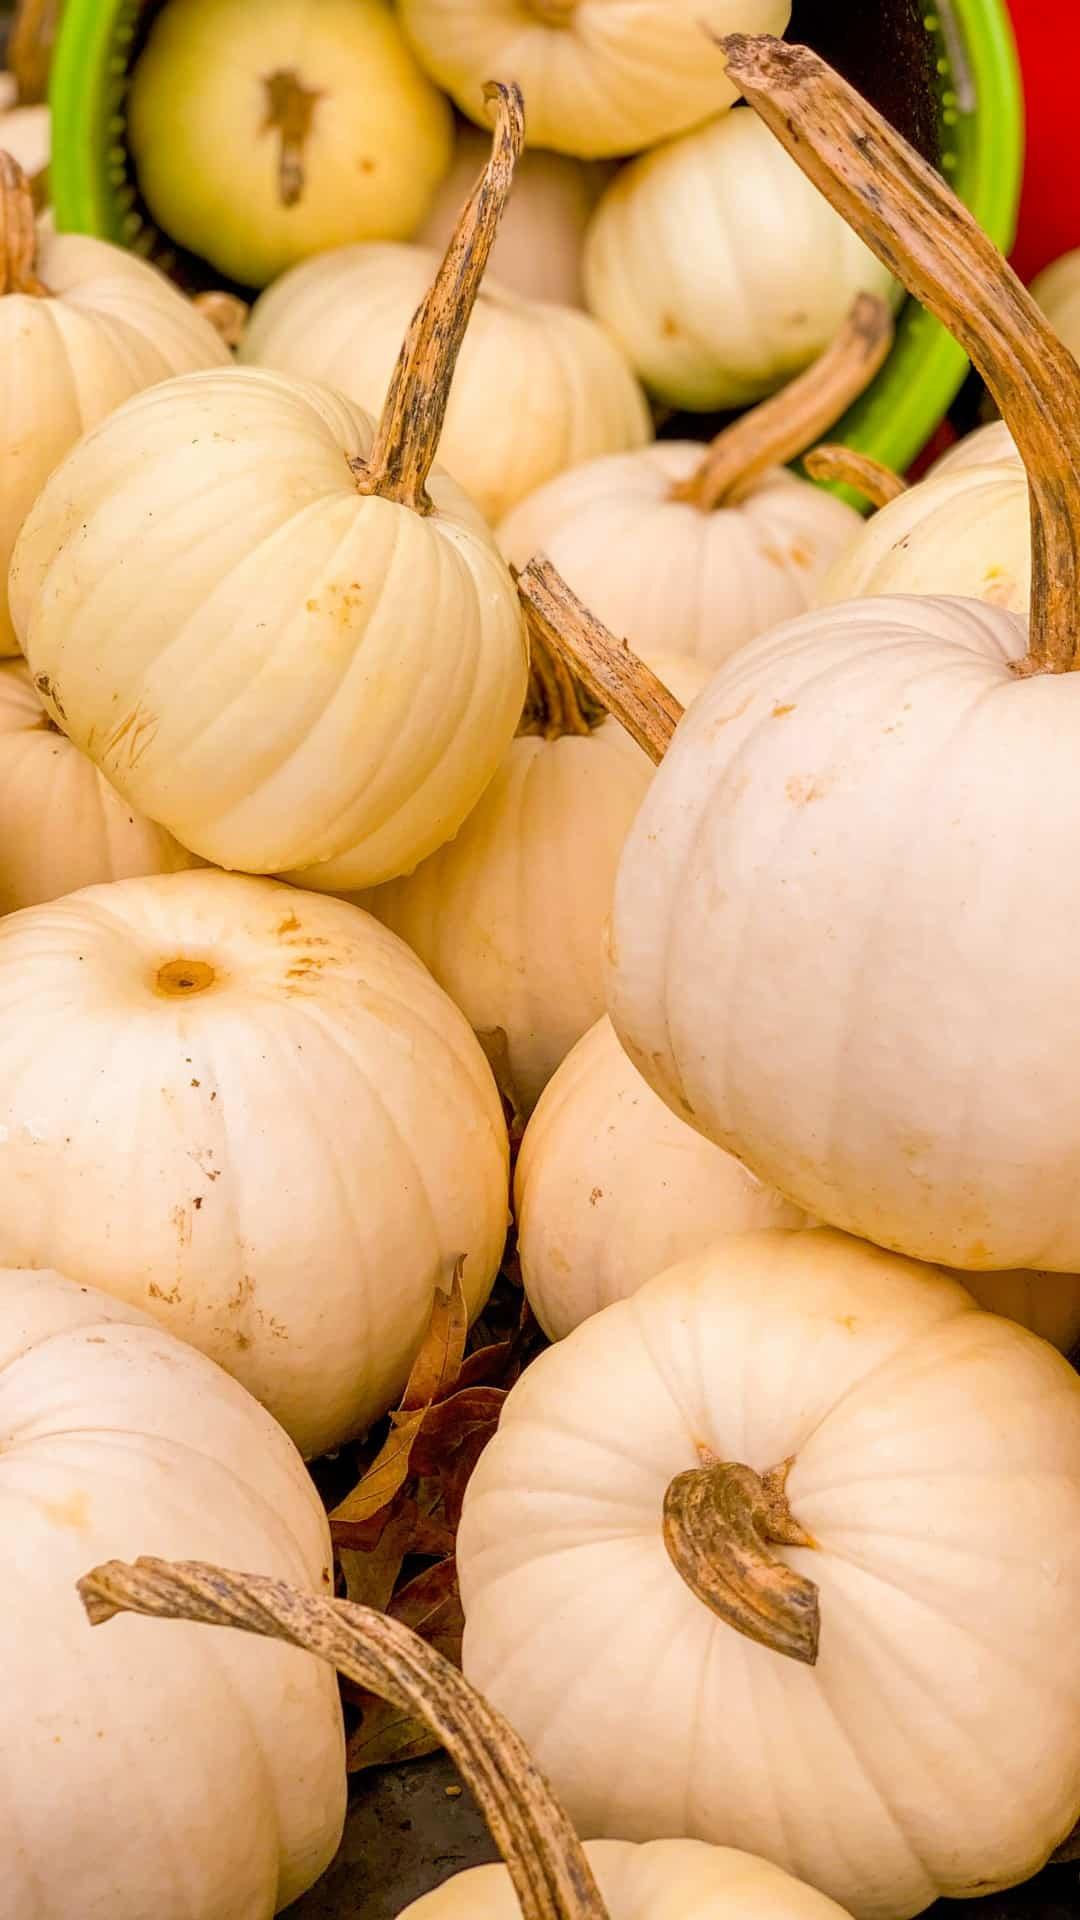 Autumn Wallpaper iPhone Aesthetic White Pumpkins